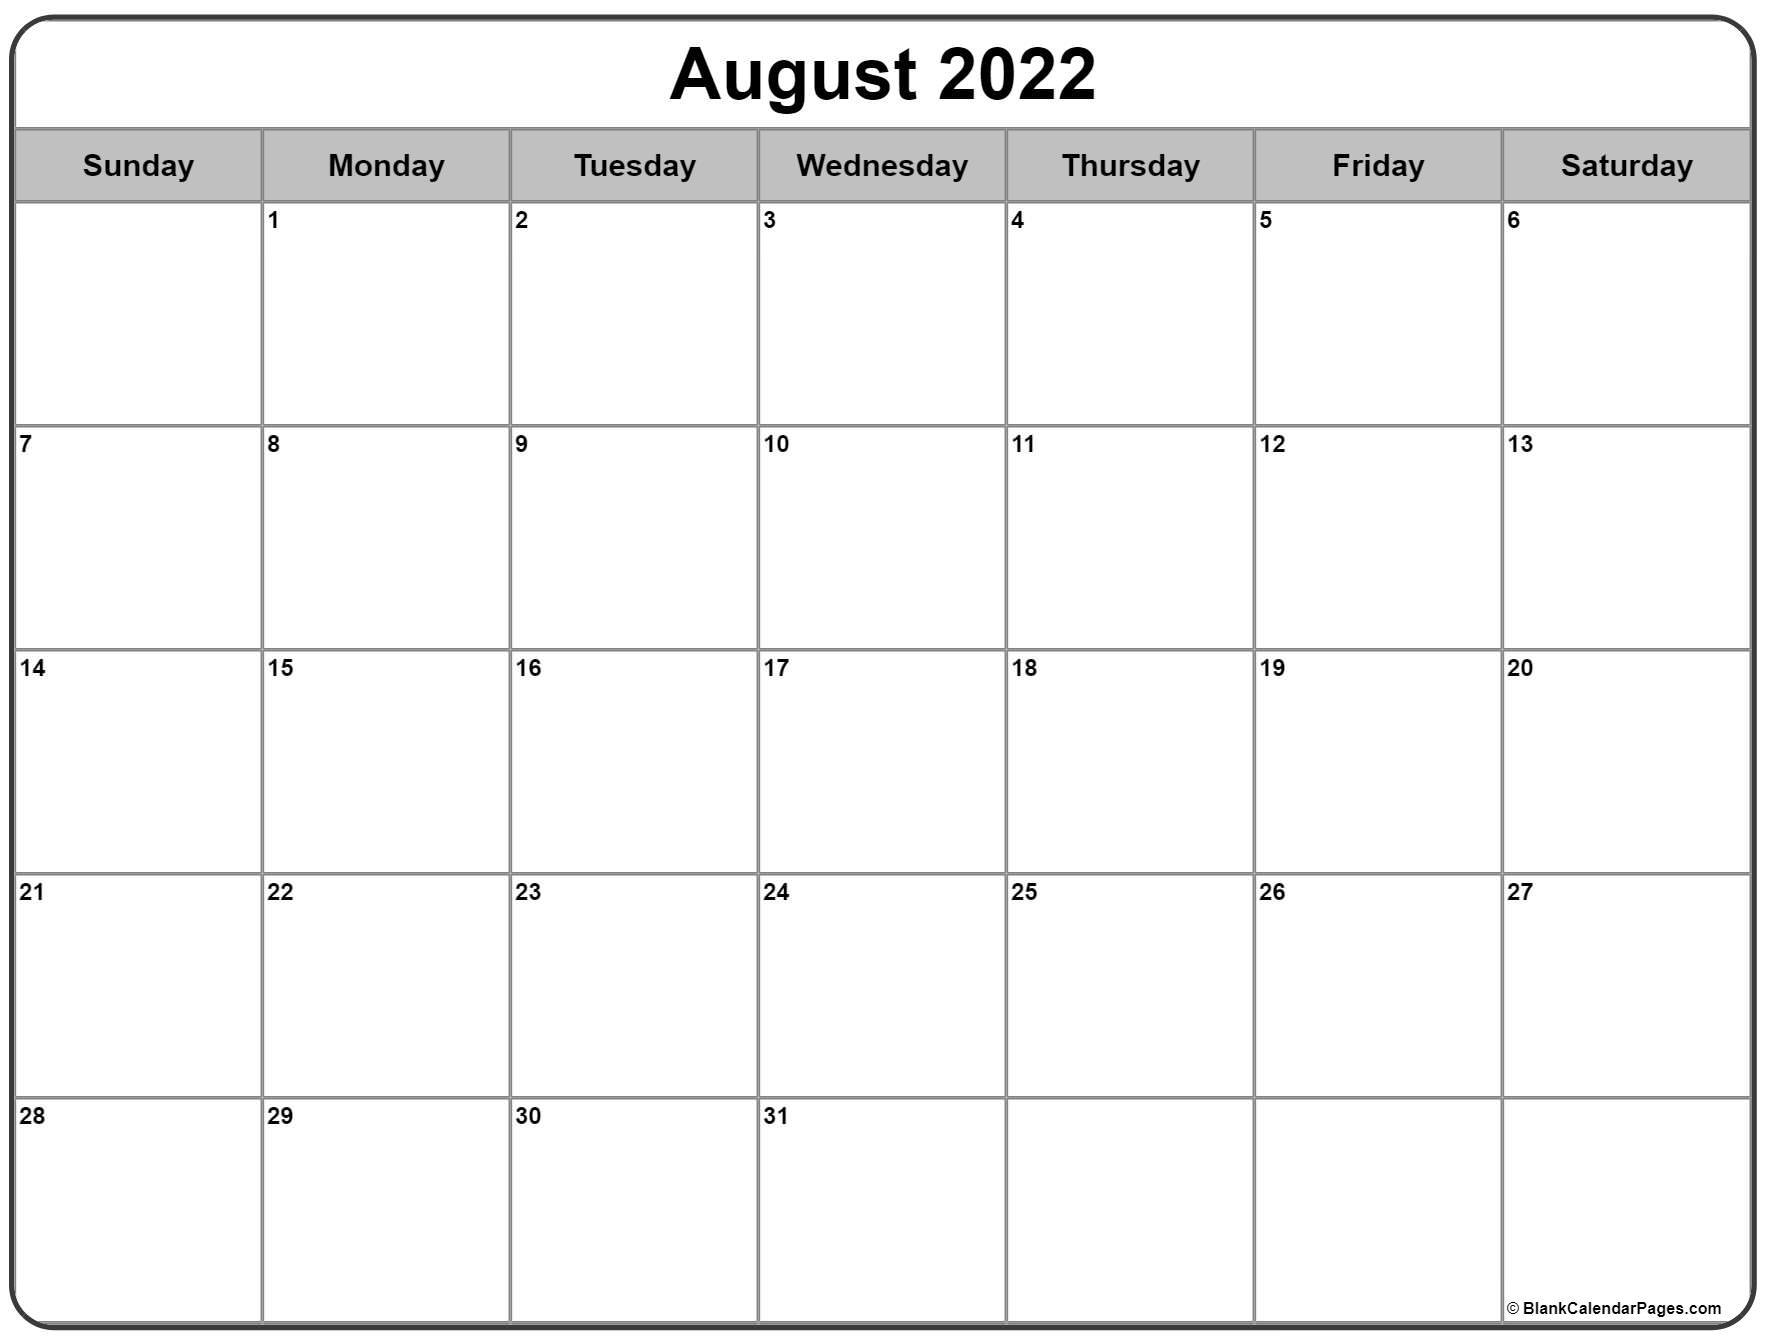 August 2022 Calendar   Free Printable Calendar Templates within Everyday Is A Holiday Calendar 2022